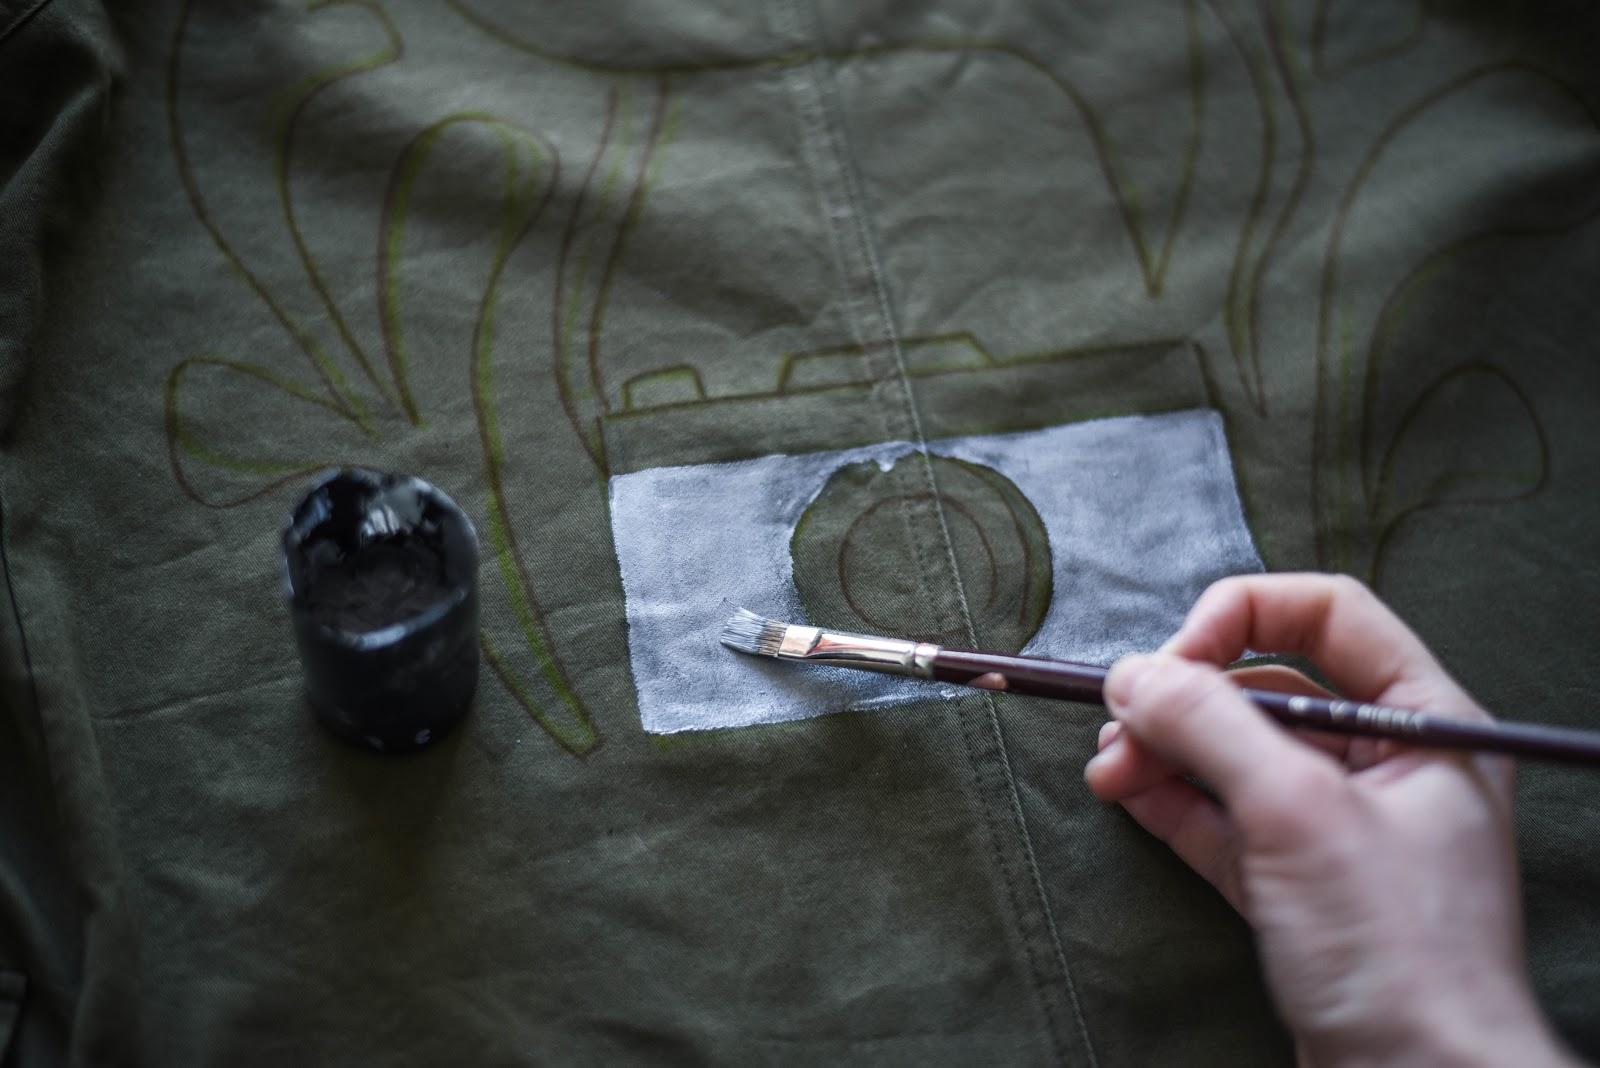 diy_customized_jacket_drawing_painted_illustration